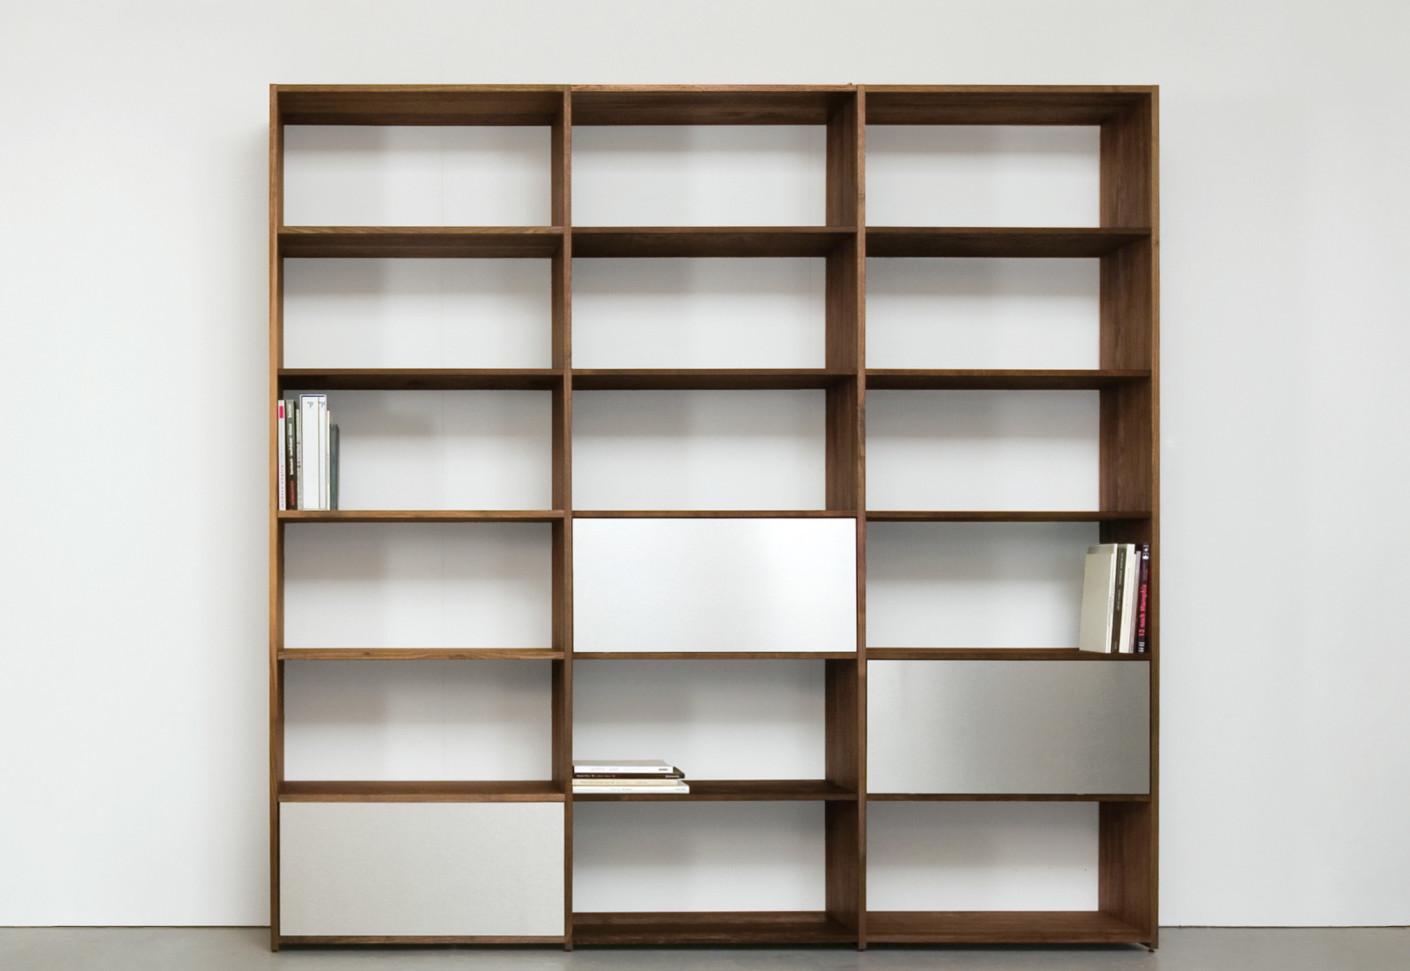 dasregal von sanktjohanser stylepark. Black Bedroom Furniture Sets. Home Design Ideas